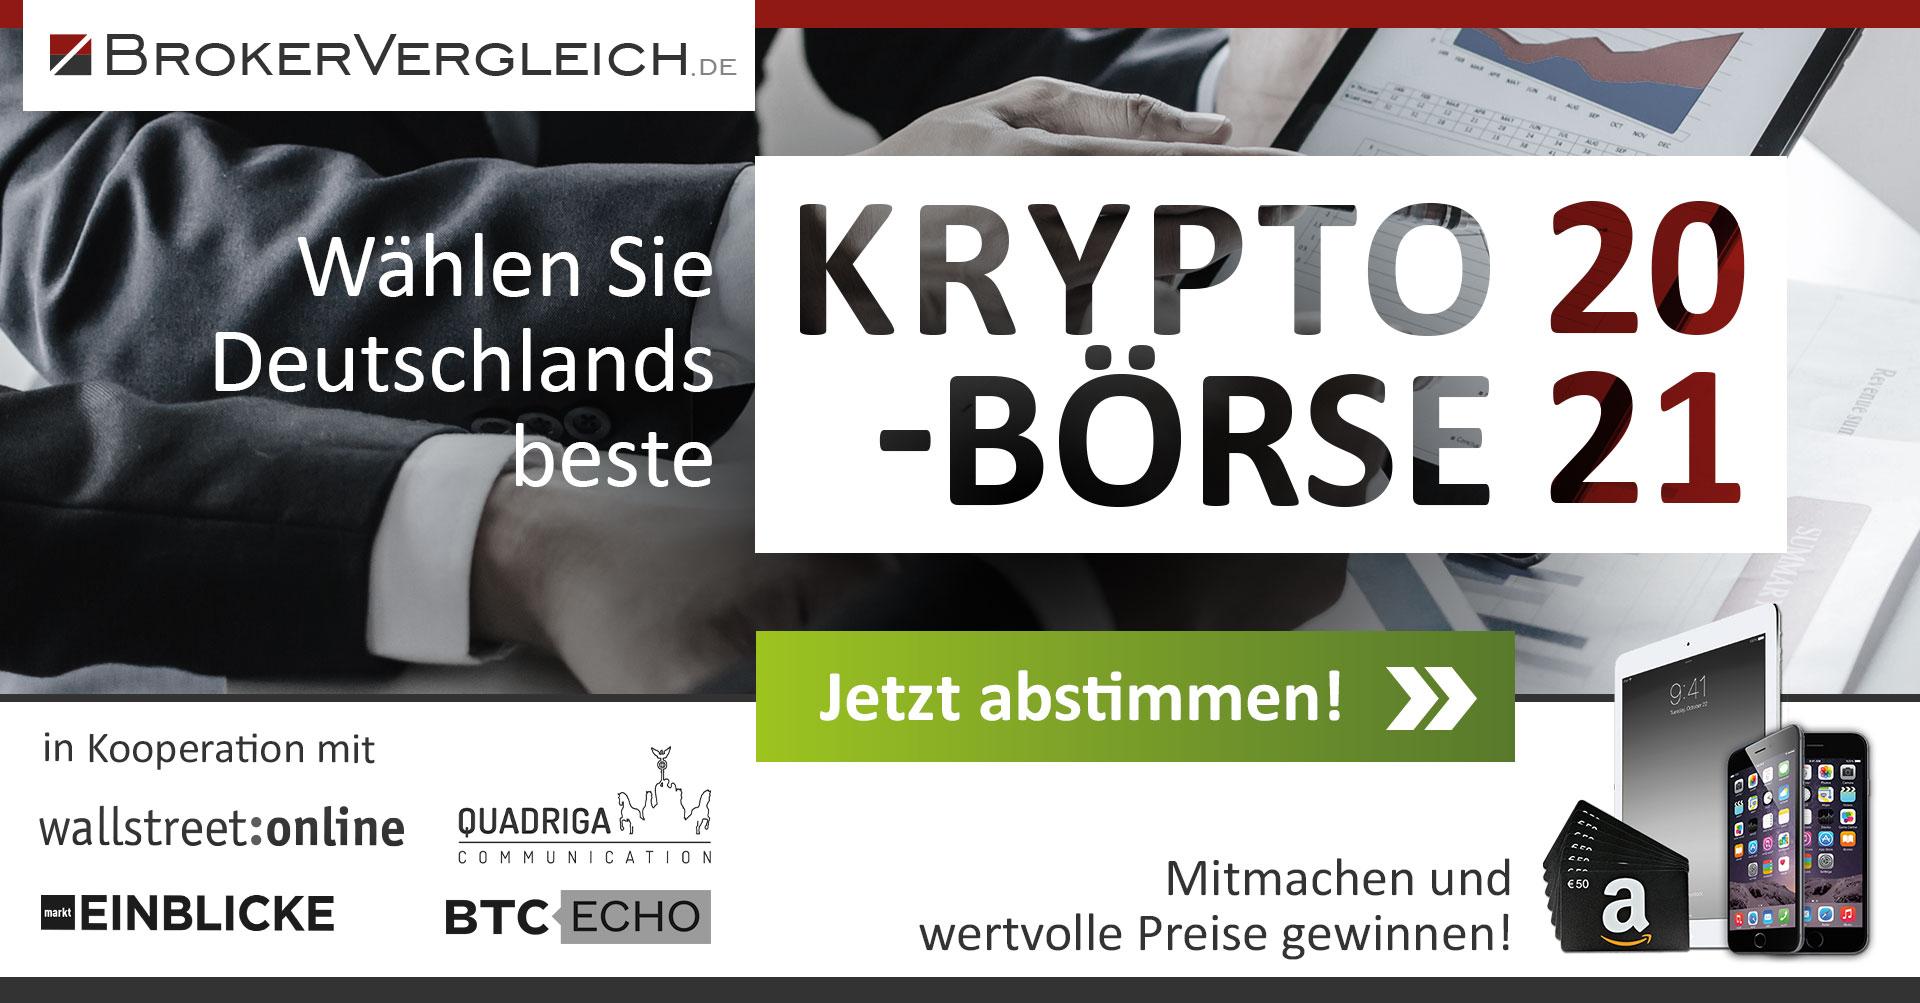 krypto-boerse-2021-brokervergleich-de-1920x1003.jpg